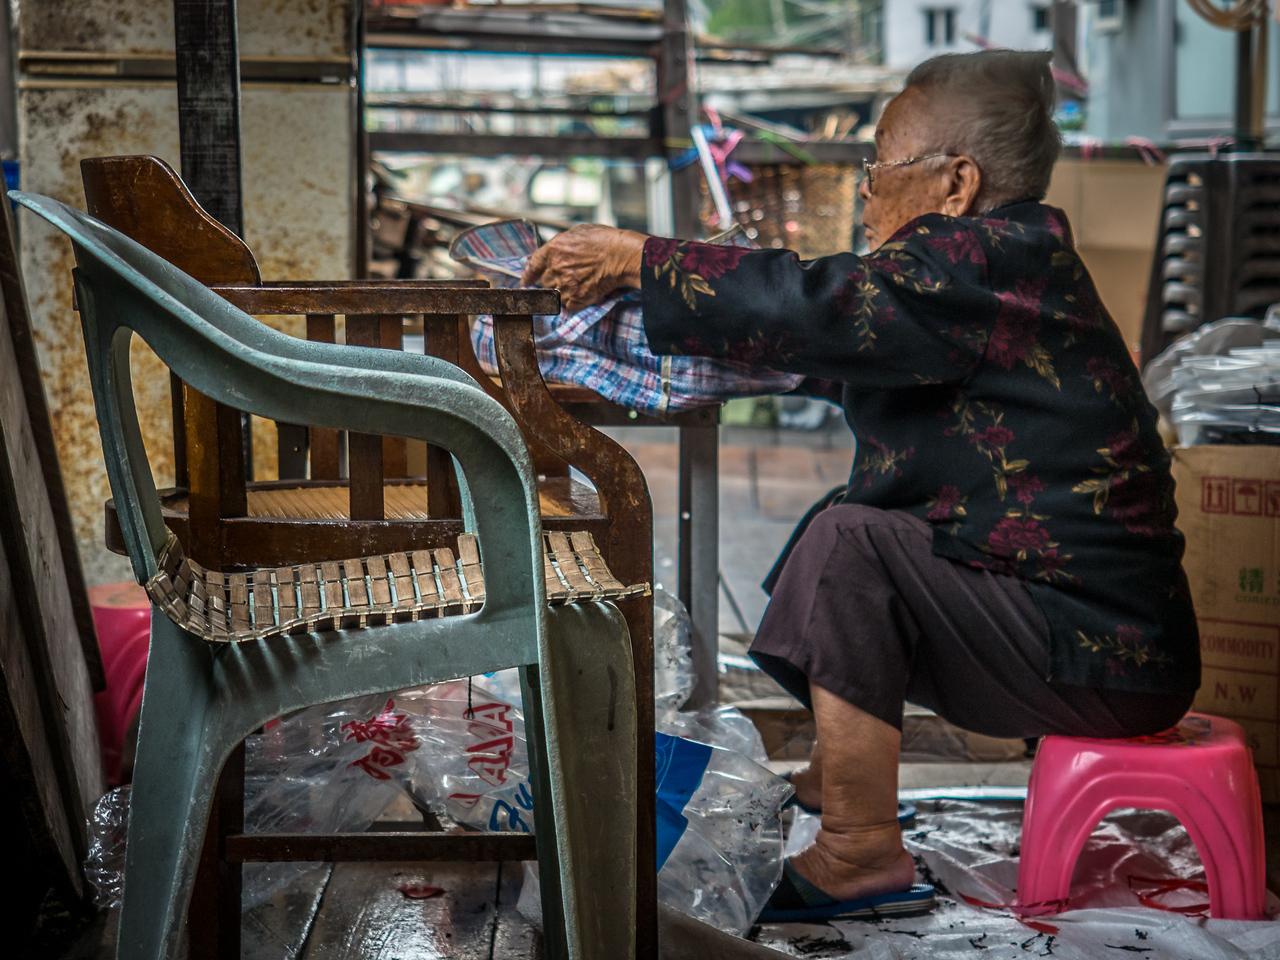 Older woman in Hong Kong market